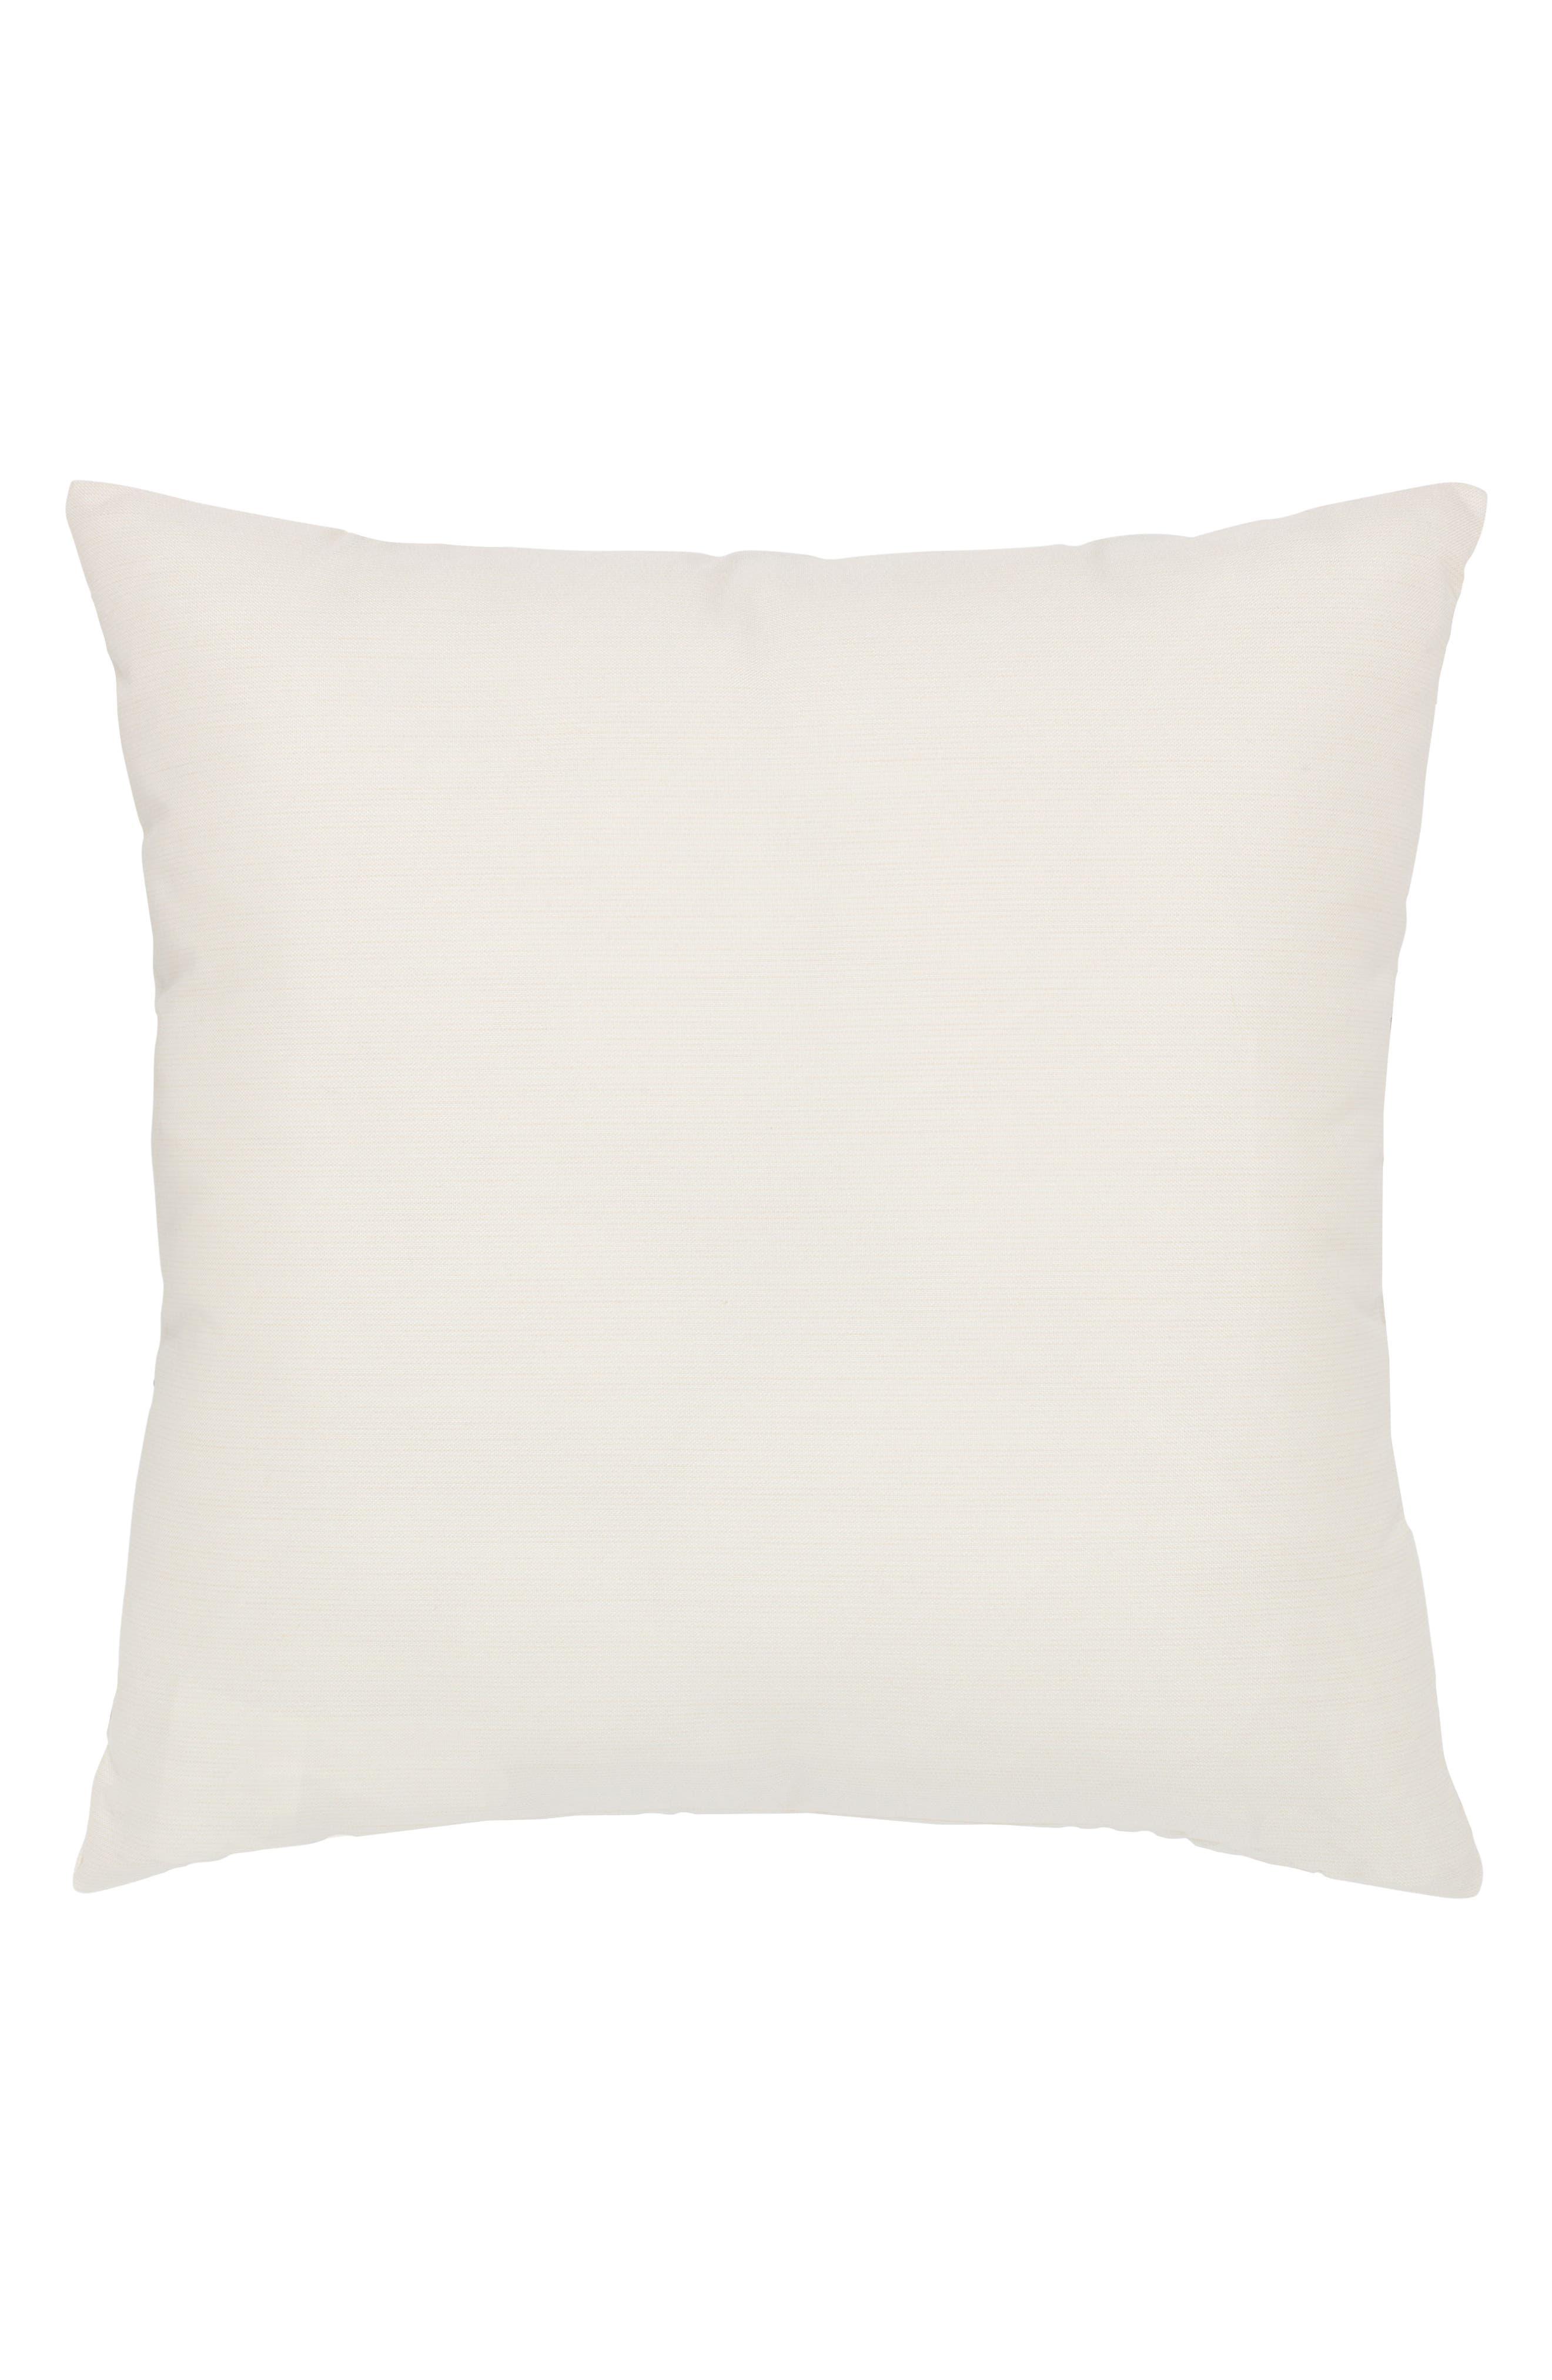 Metallic Block Indoor/Outdoor Accent Pillow,                             Alternate thumbnail 2, color,                             Gold/ Grey